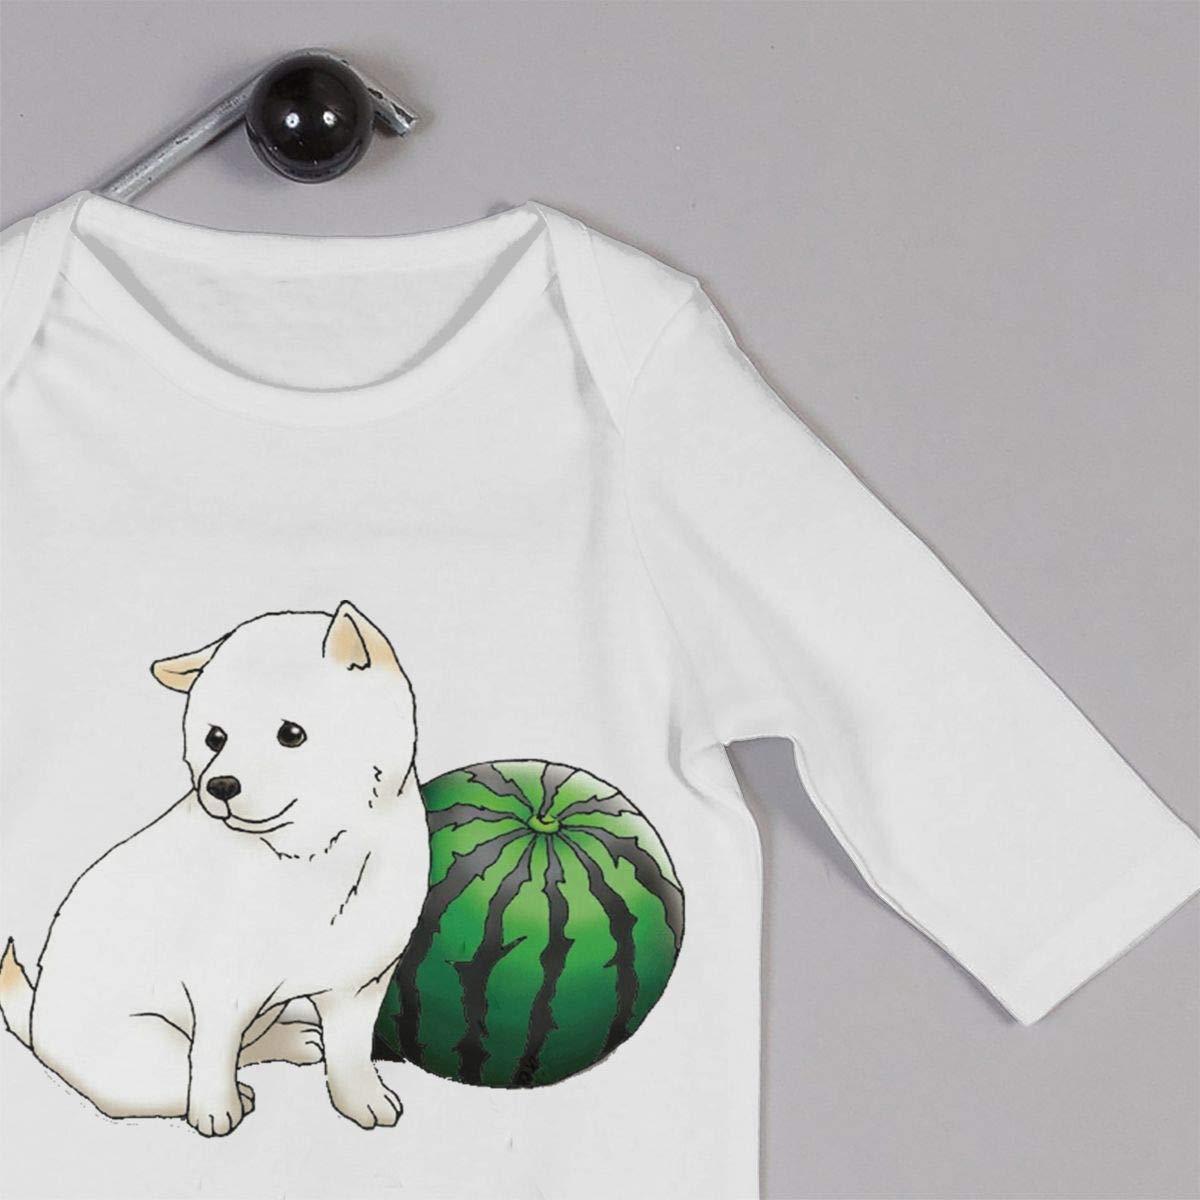 nordic runes Shiba Inu Dog Baby Onesies Toddler Baby Girl//Boy Unisex Clothes Romper Jumpsuit Bodysuit One Piece